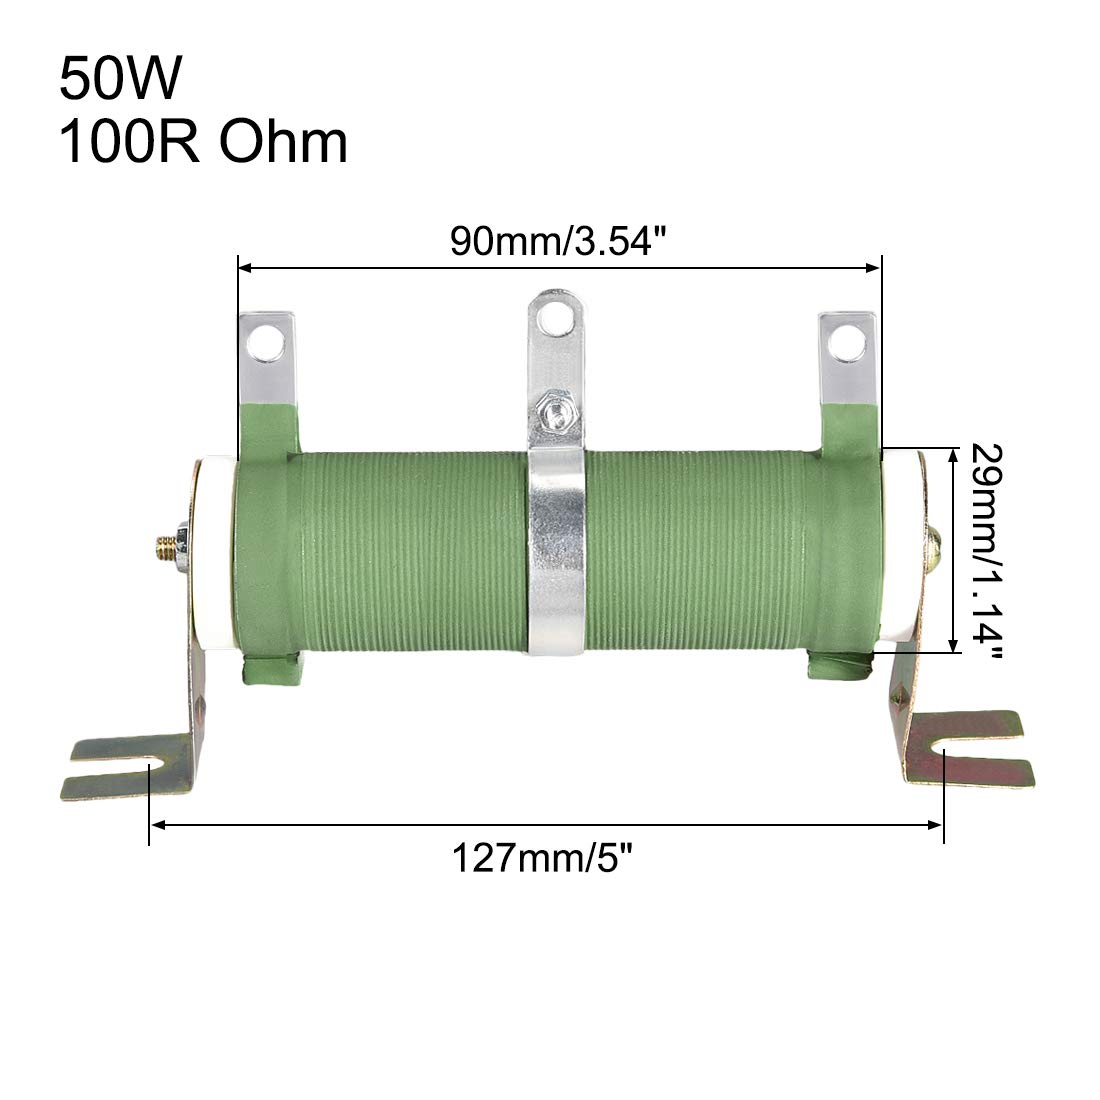 uxcell 50W Watt 100R Ohm High Power Wirewound Resistor Ceramic Tubular Adjustable Wire Wound Rheostat Resistor